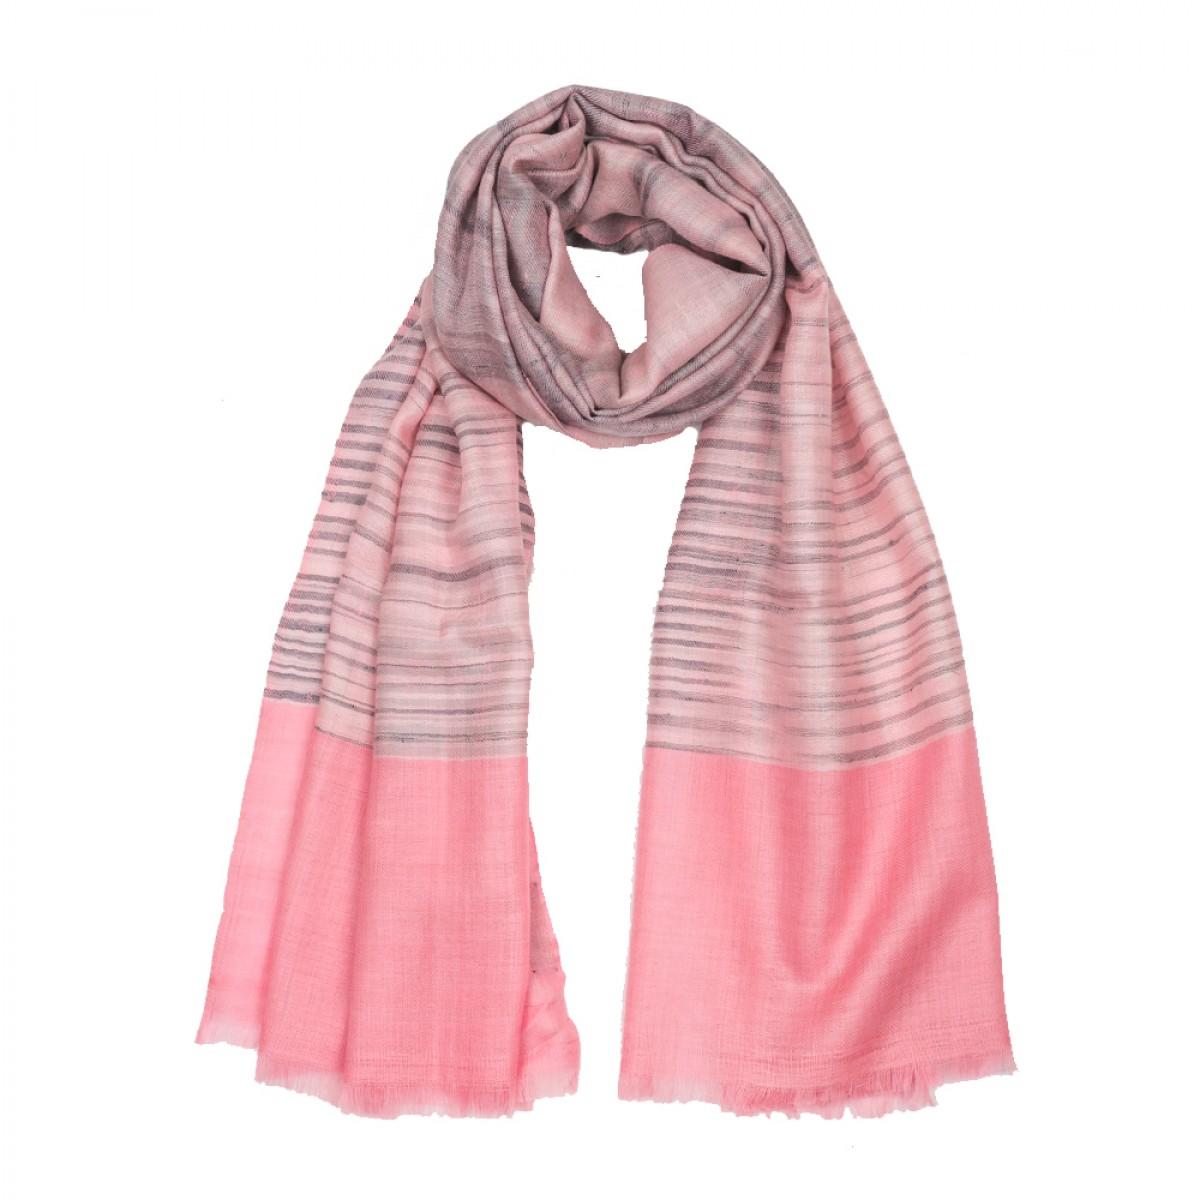 Ikat Cashmere Pashmina Stole - Pink